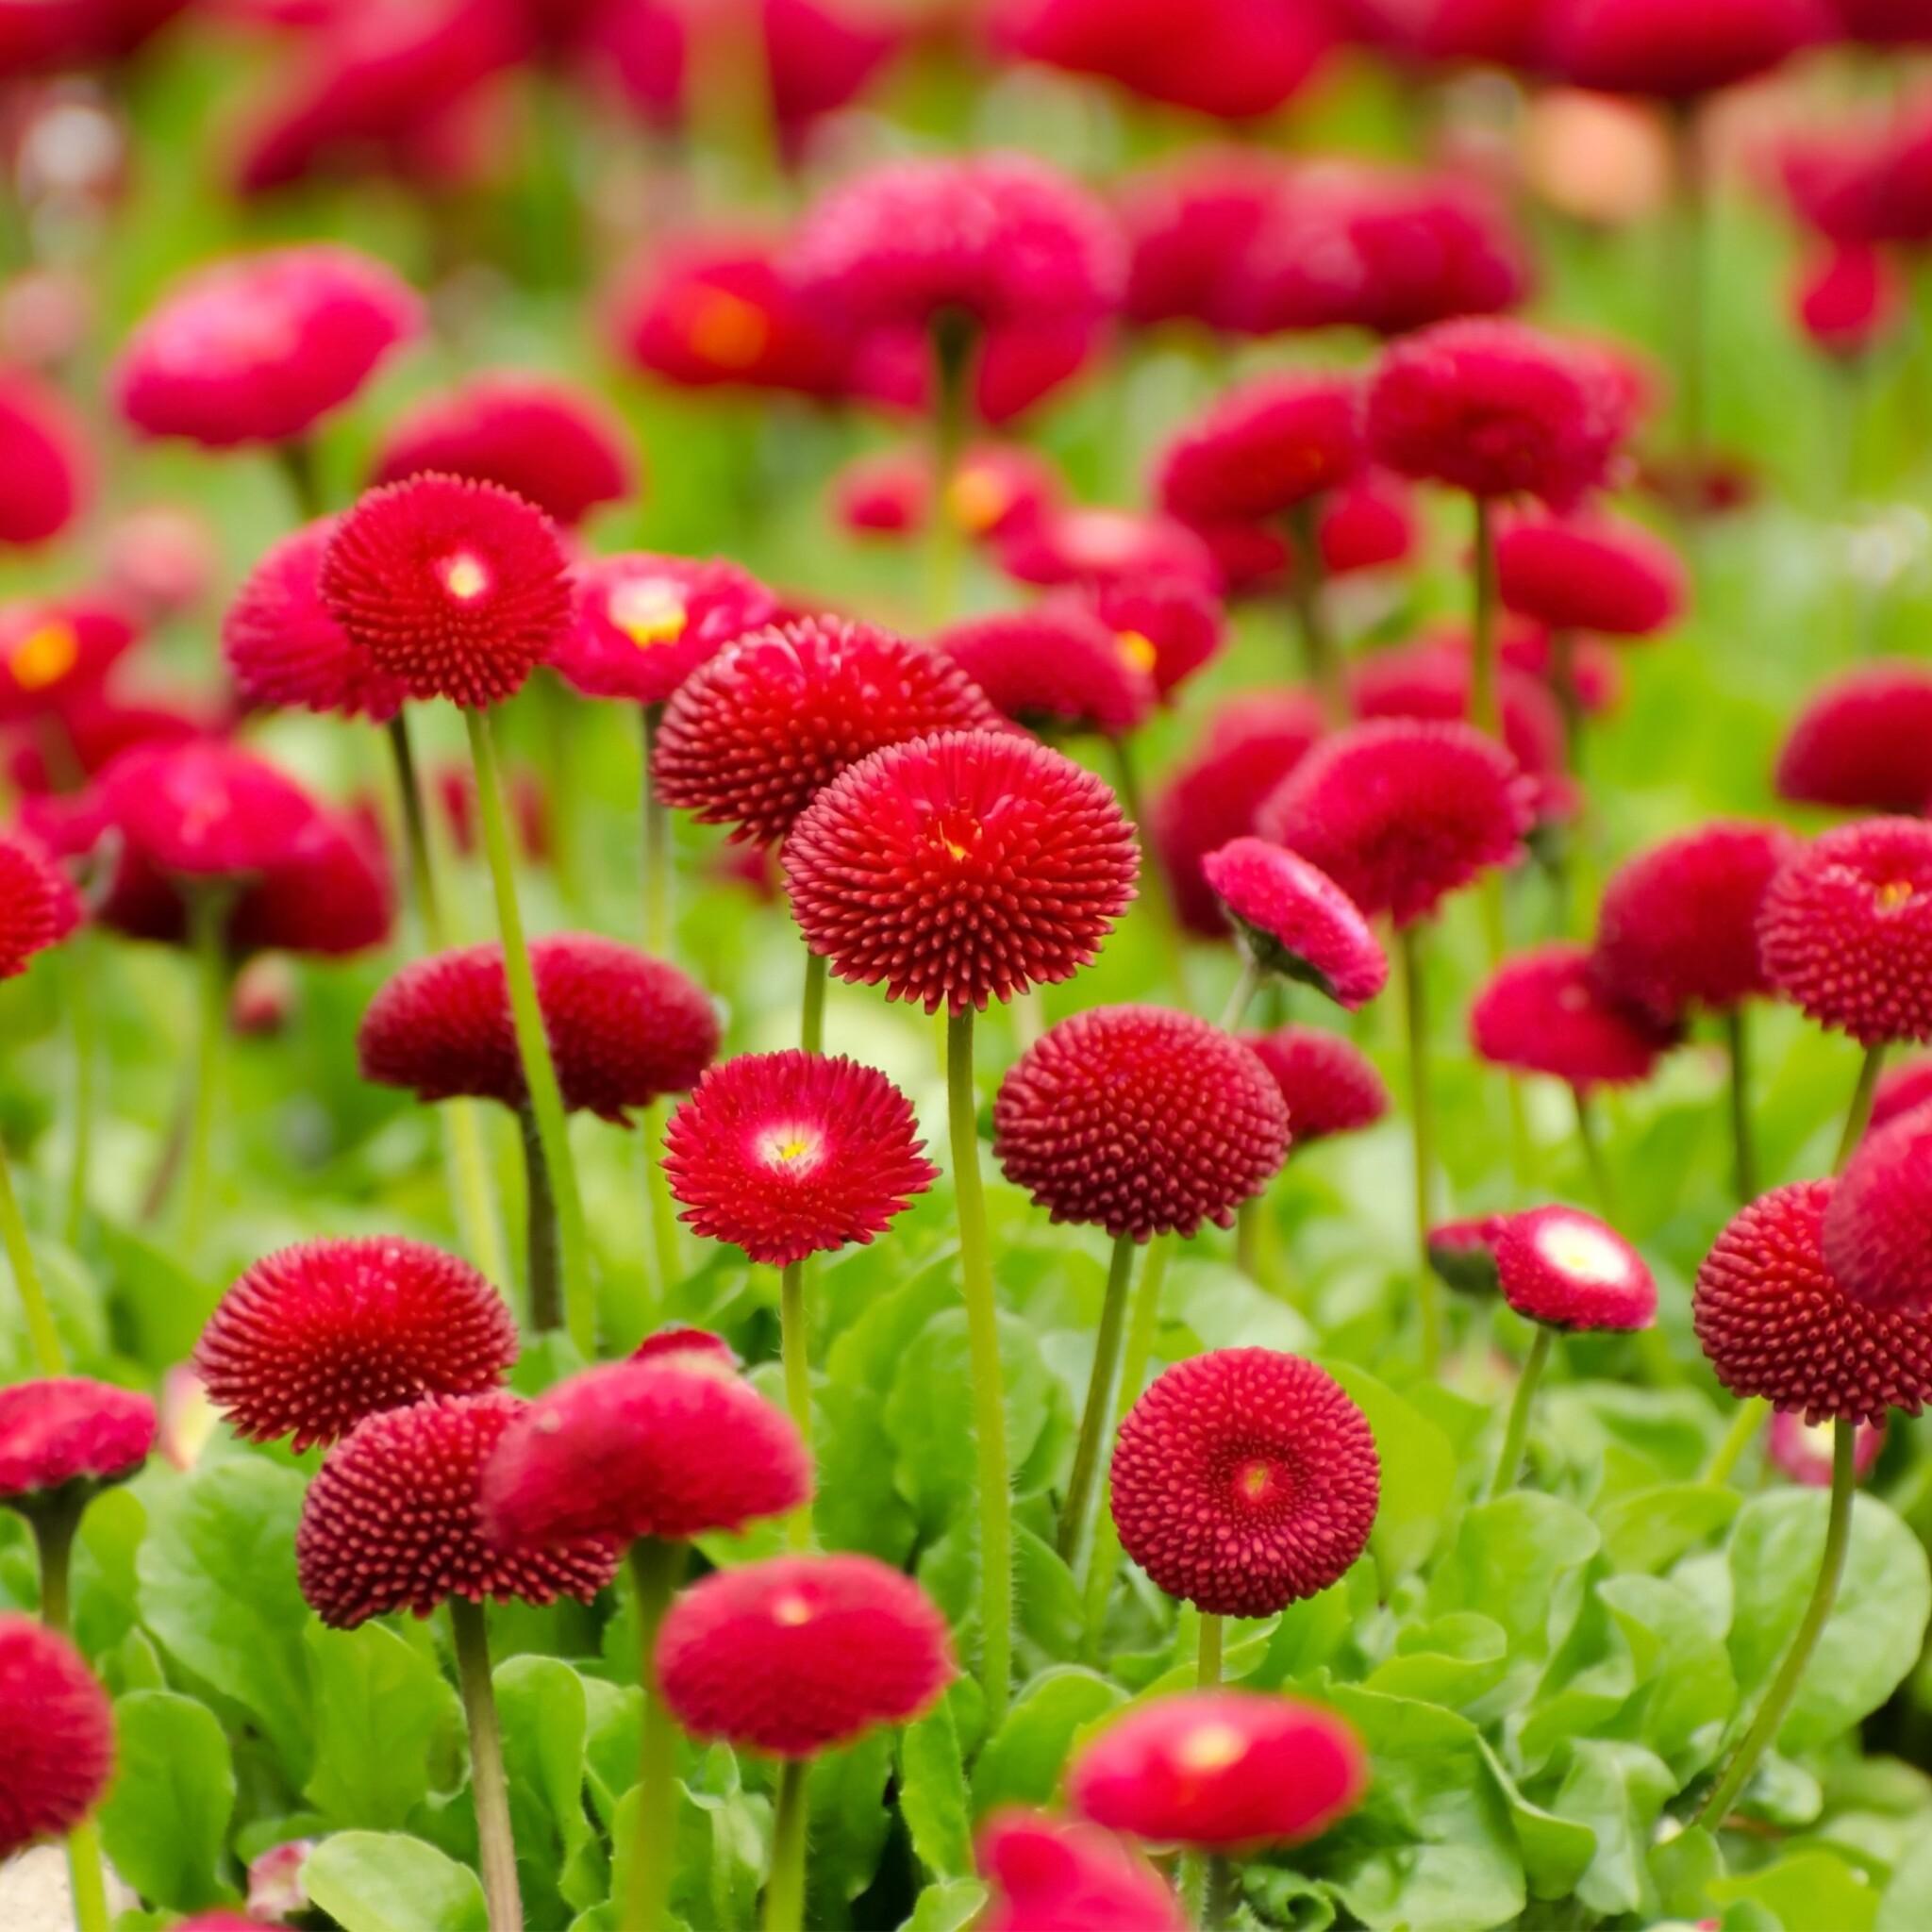 flowers-red-summer.jpg